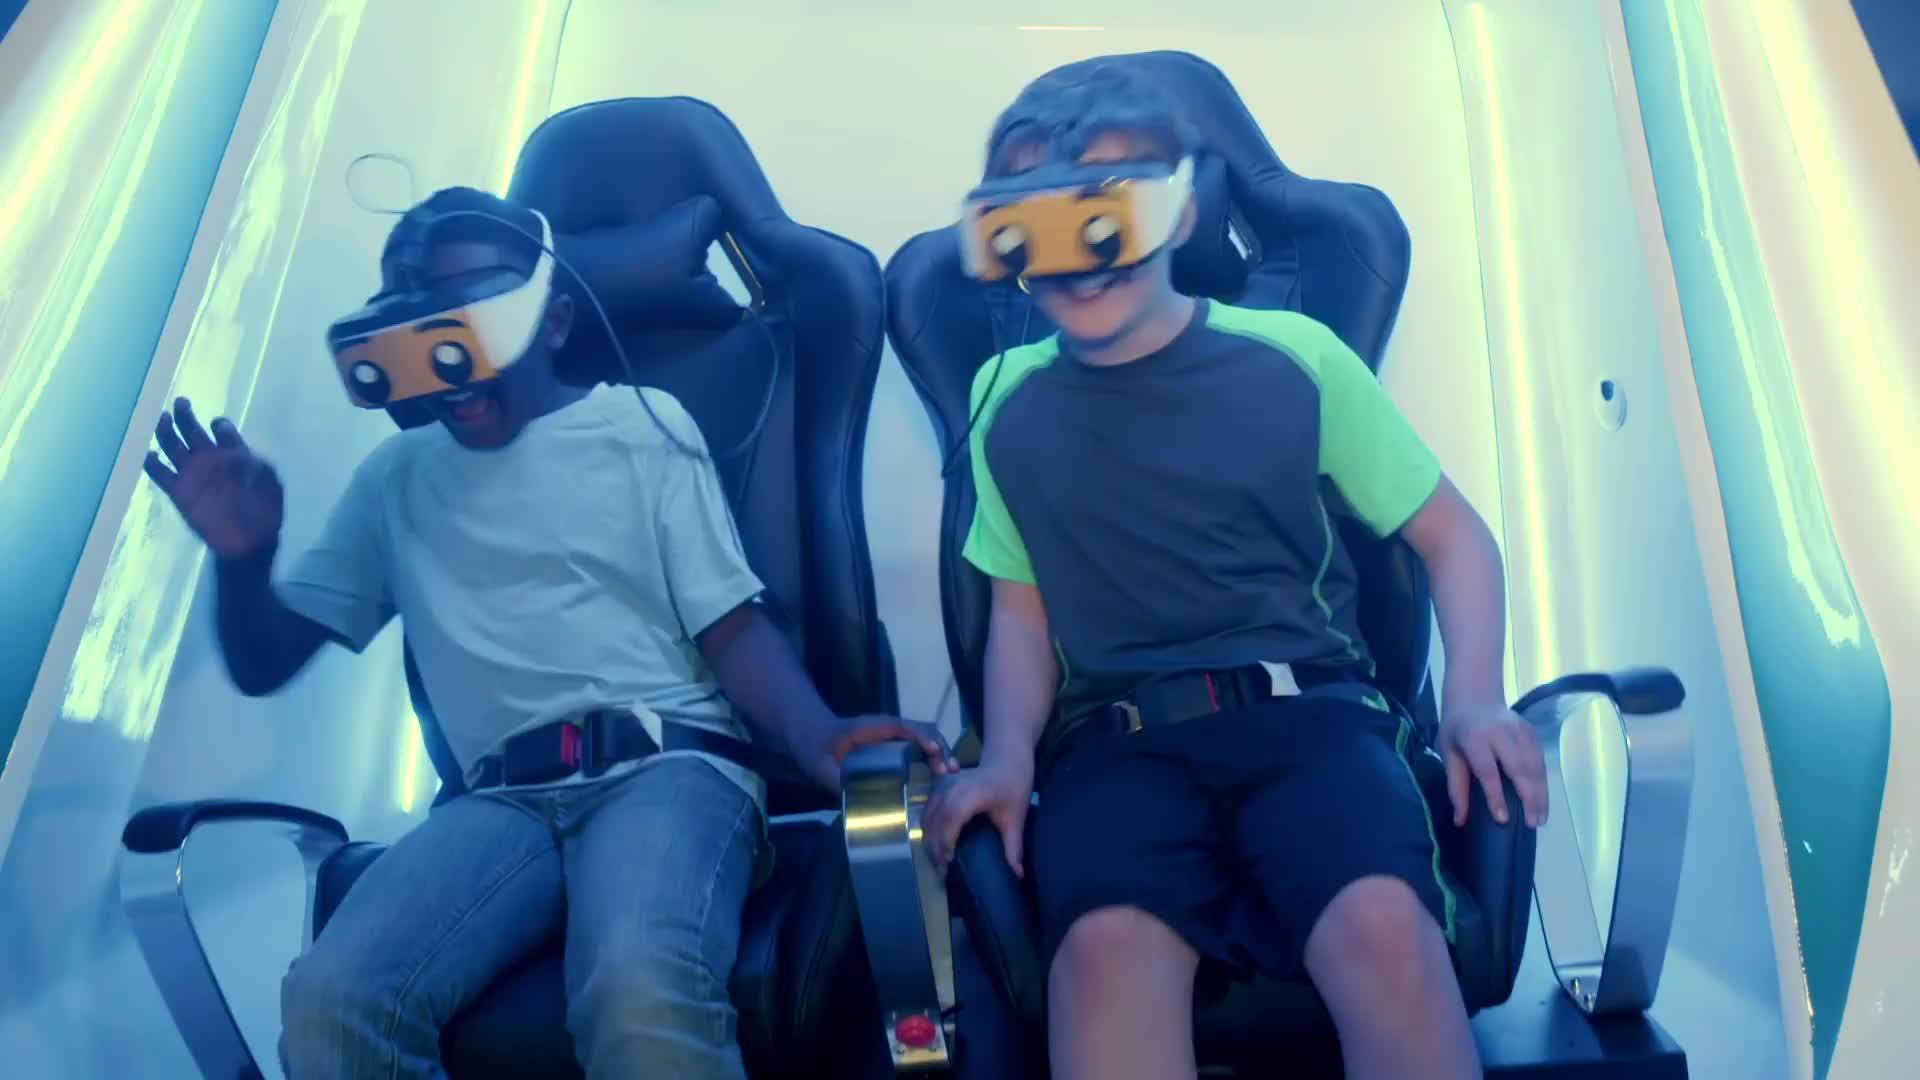 Amusement Park Rides 9D Cinema Vr Simulator Virtual Reality Simulation Rides 9D Vr Game Machine